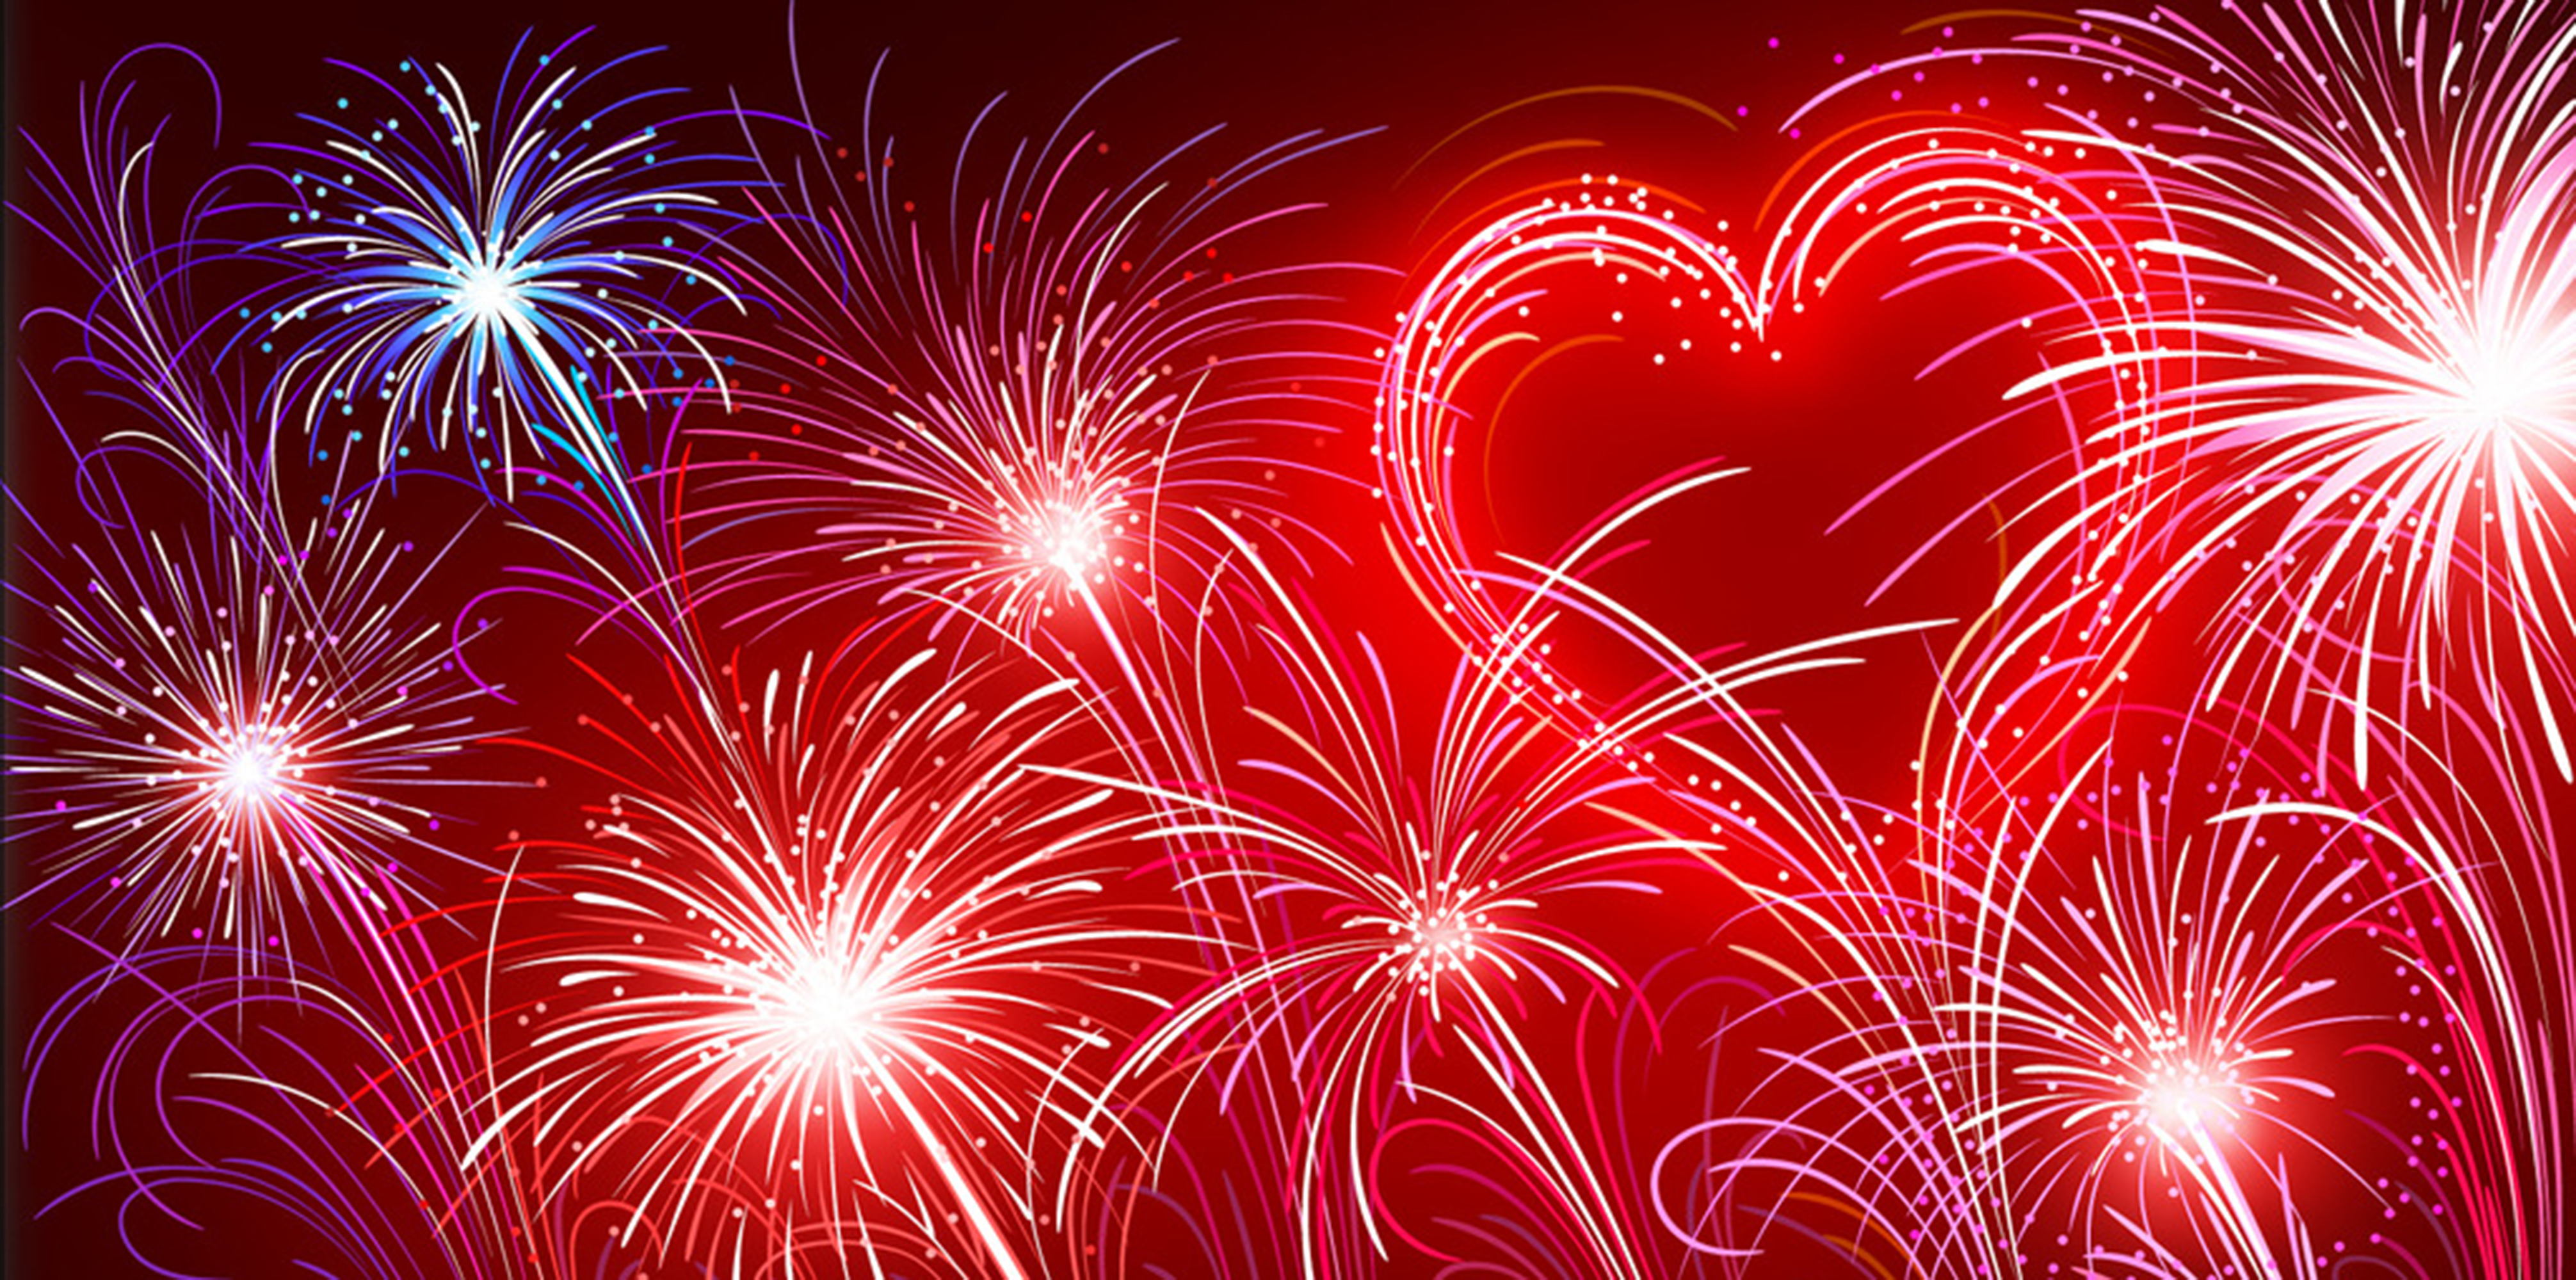 feu d artifice de fond en forme de coeur feux d artifice